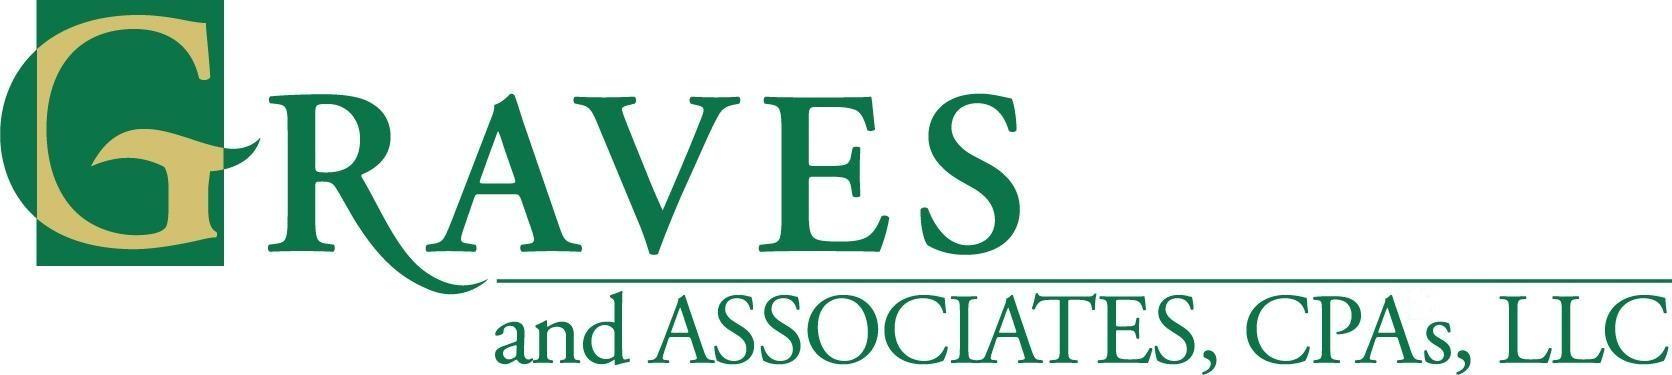 Graves and Associates CPAs